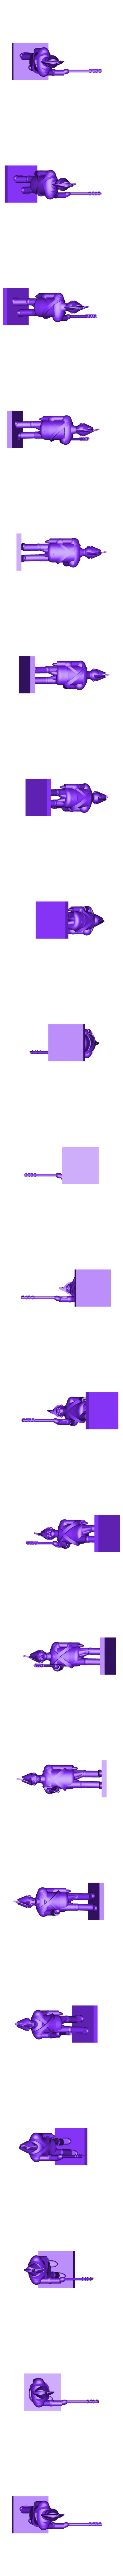 aus_hart_man3.stl Download free STL file Napoleonics - Part 14 - Austrian Gun Crew • 3D printing design, Earsling